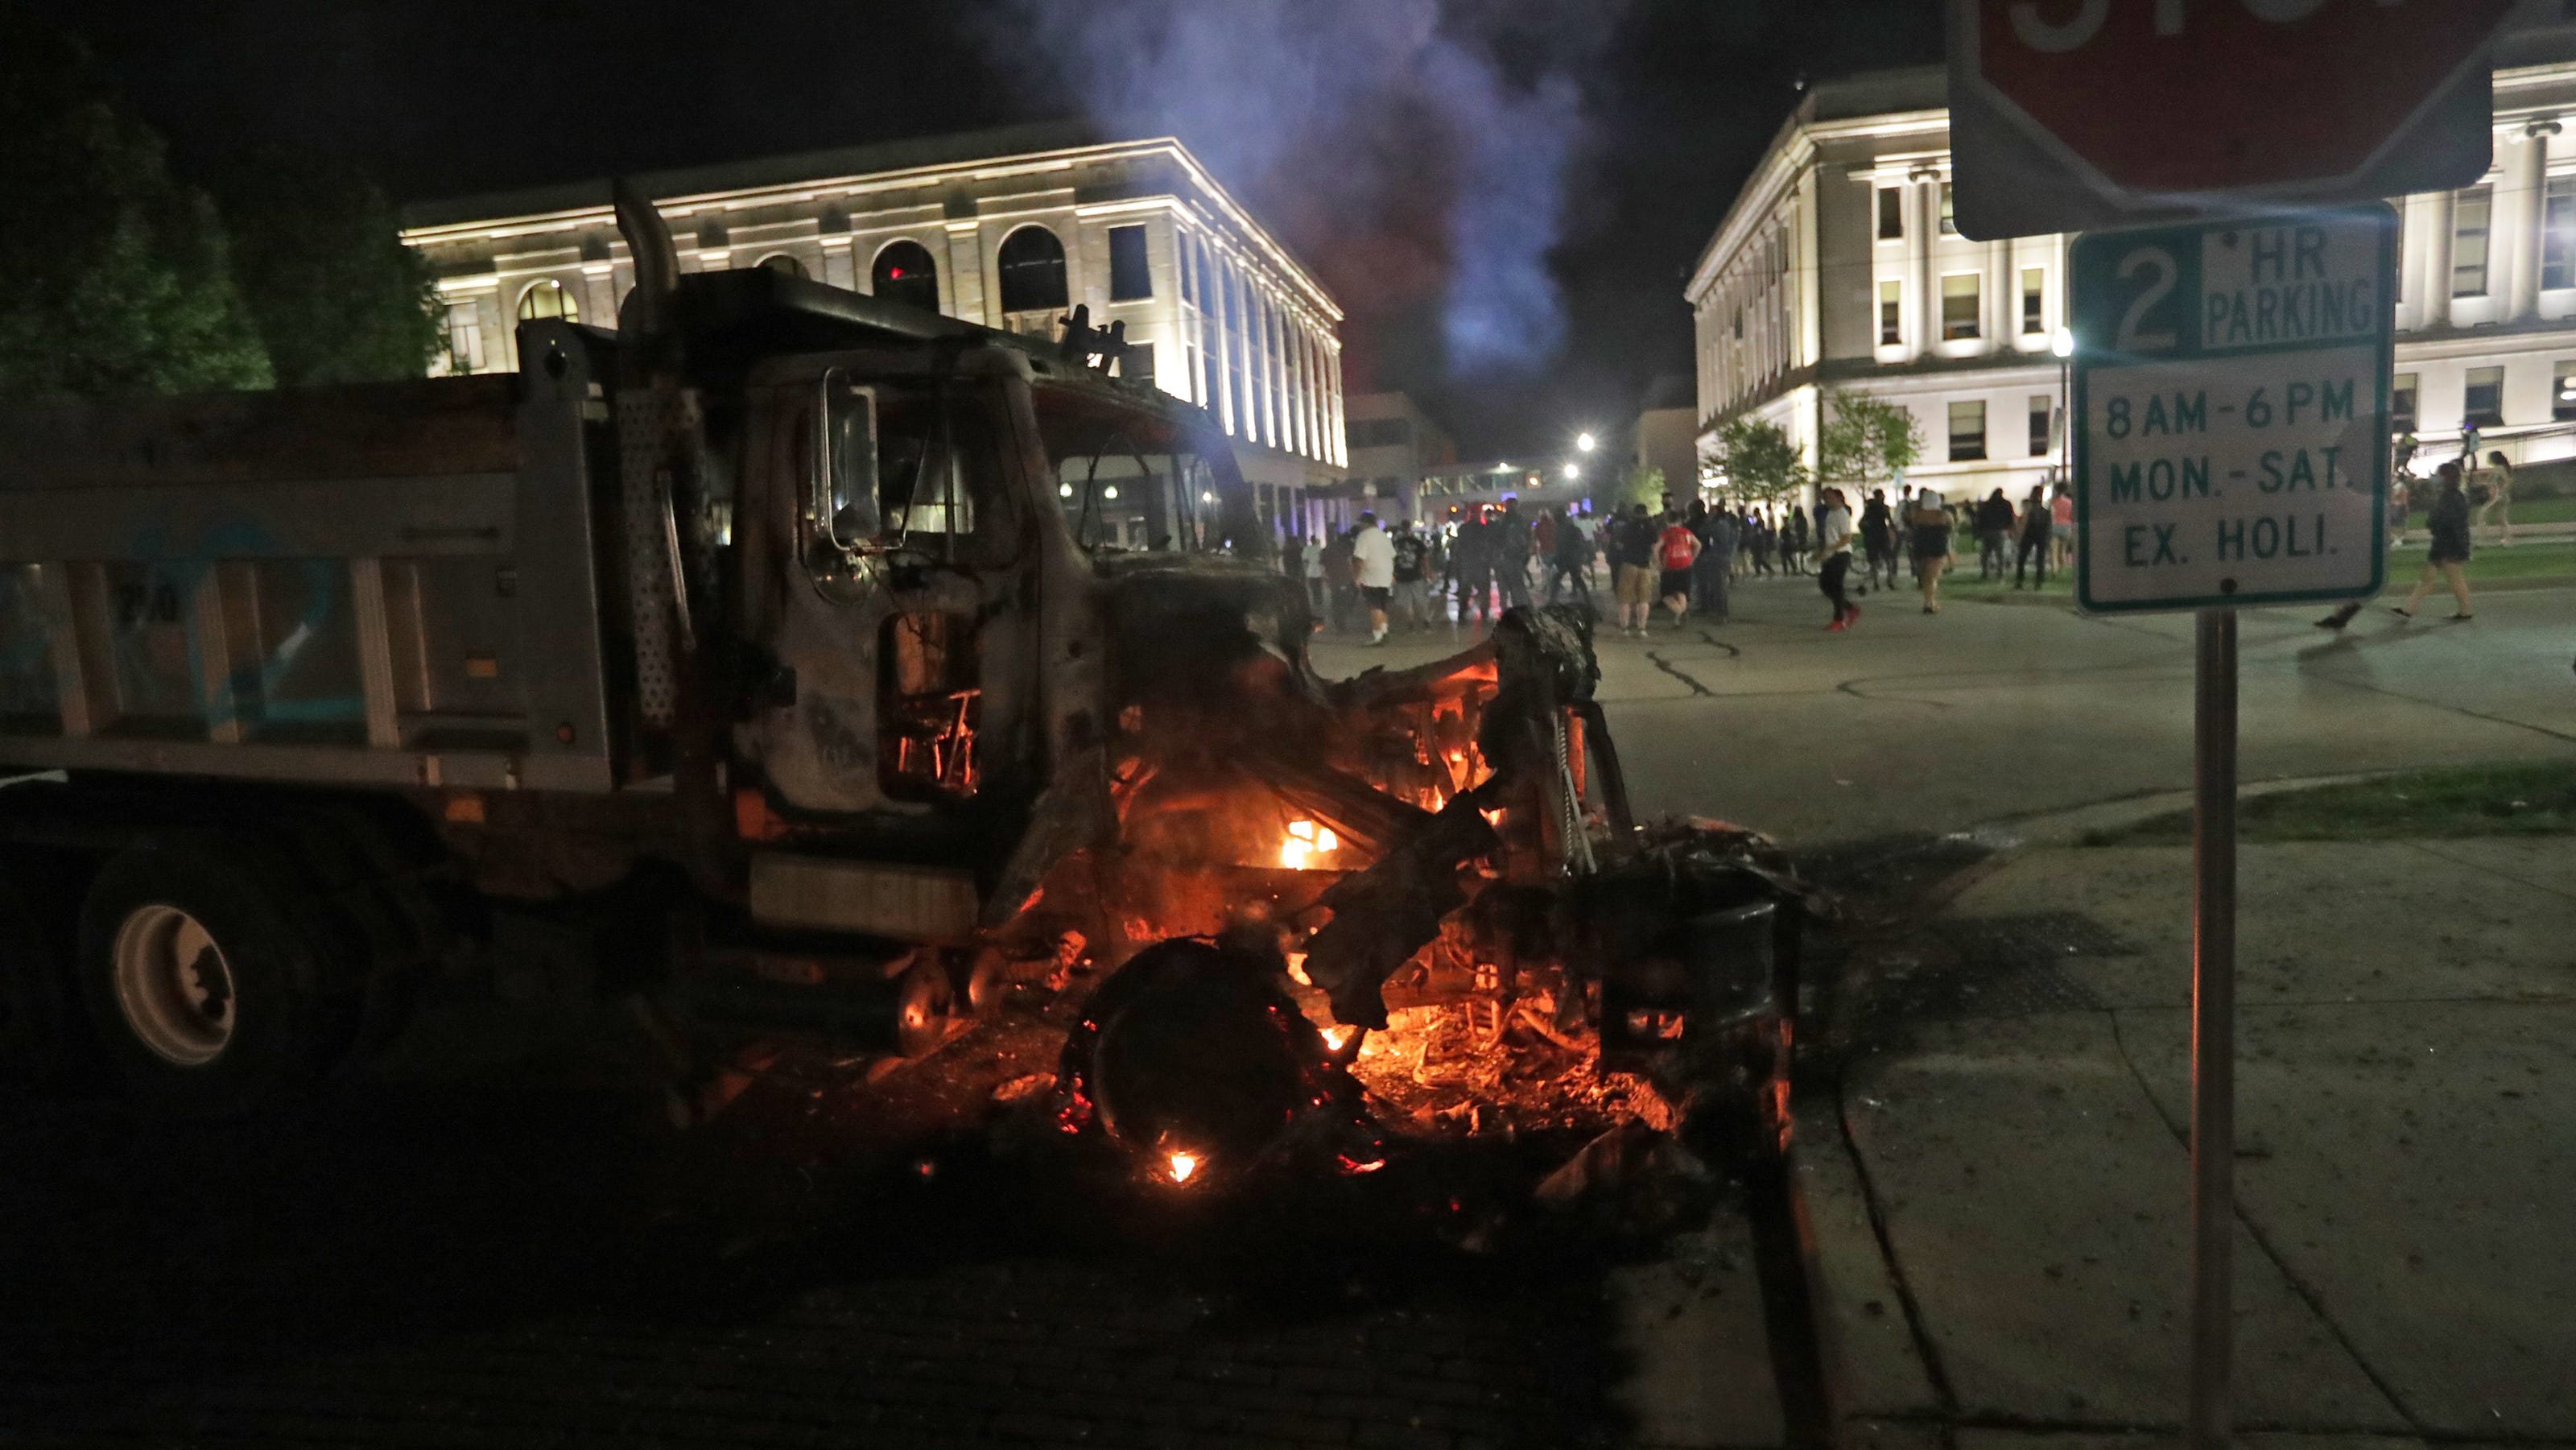 Kenosha protest shooting: 2 dead, 1 injured; police look for gunman